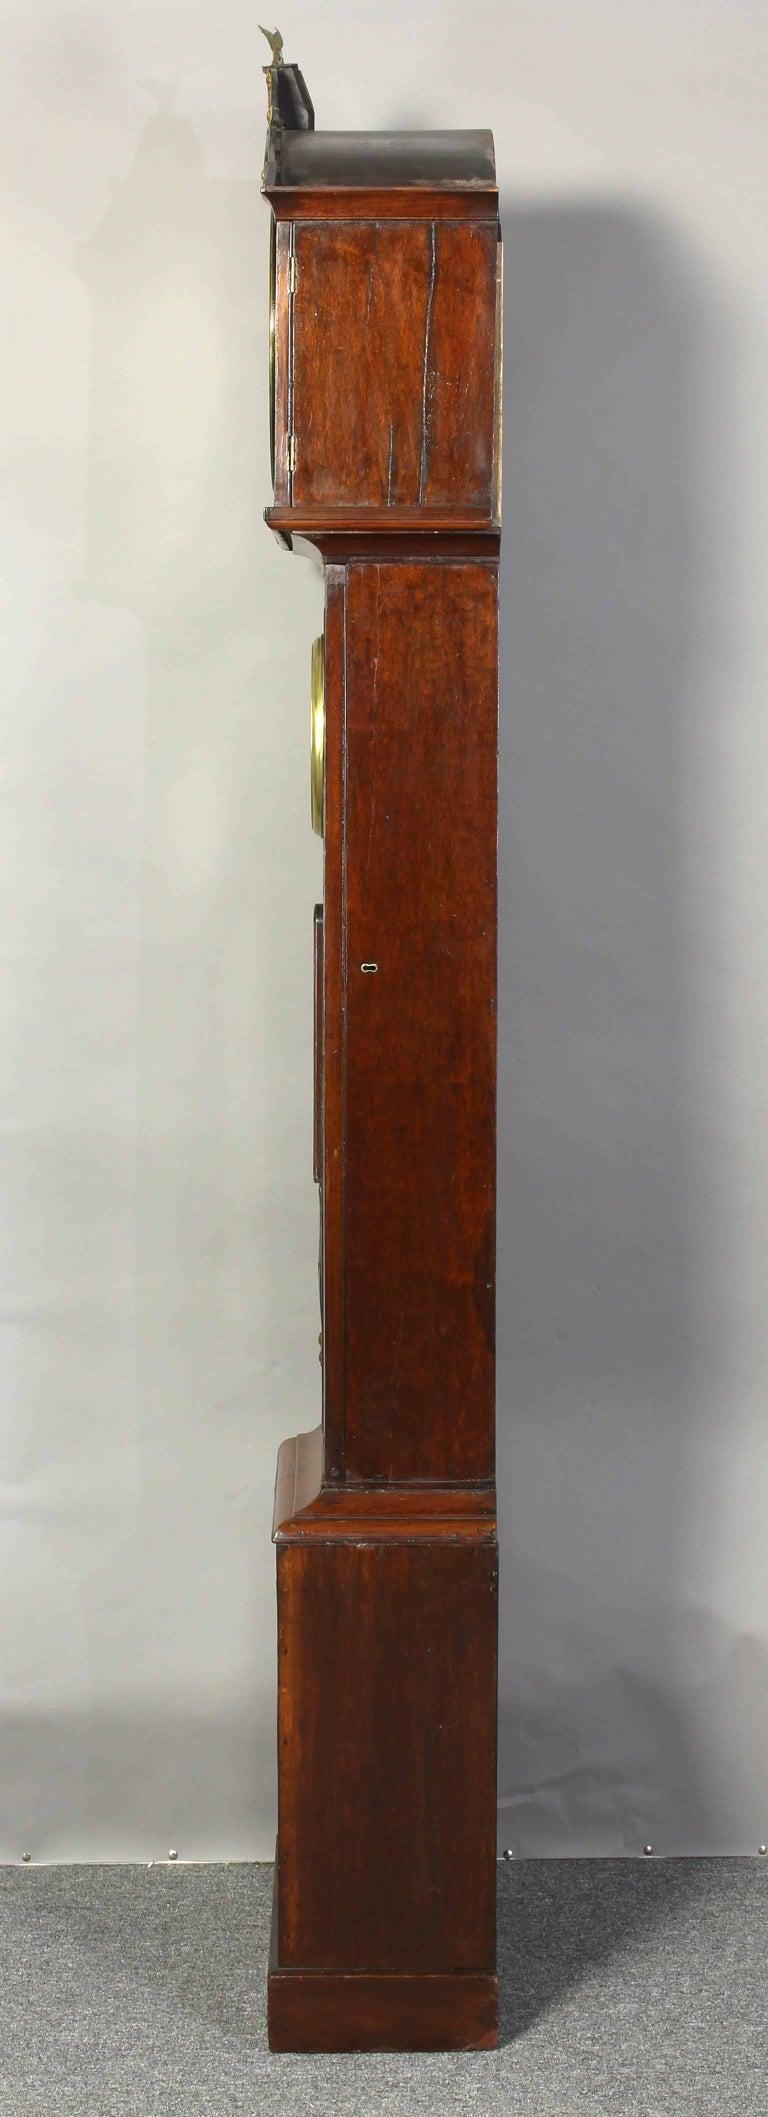 Irish Regency Eight Day Tall Case Clock 4